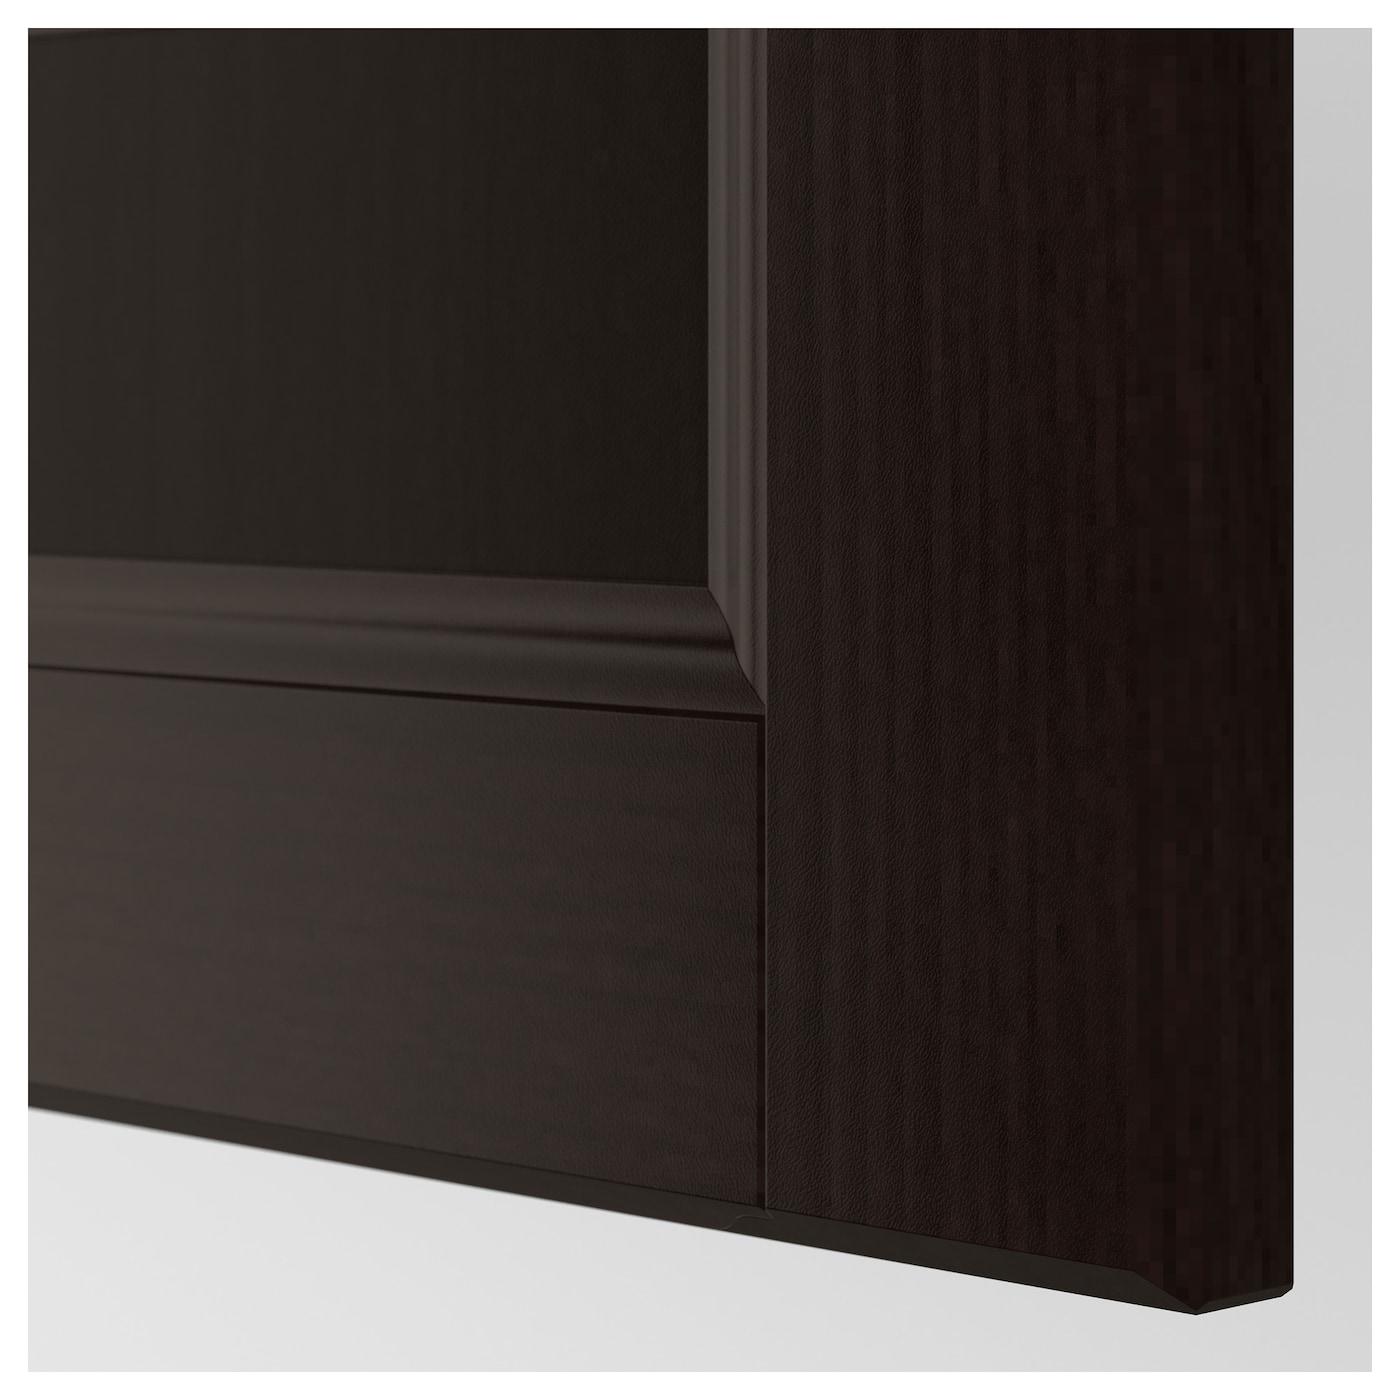 laxarby face de tiroir brun noir 60x40 cm ikea. Black Bedroom Furniture Sets. Home Design Ideas